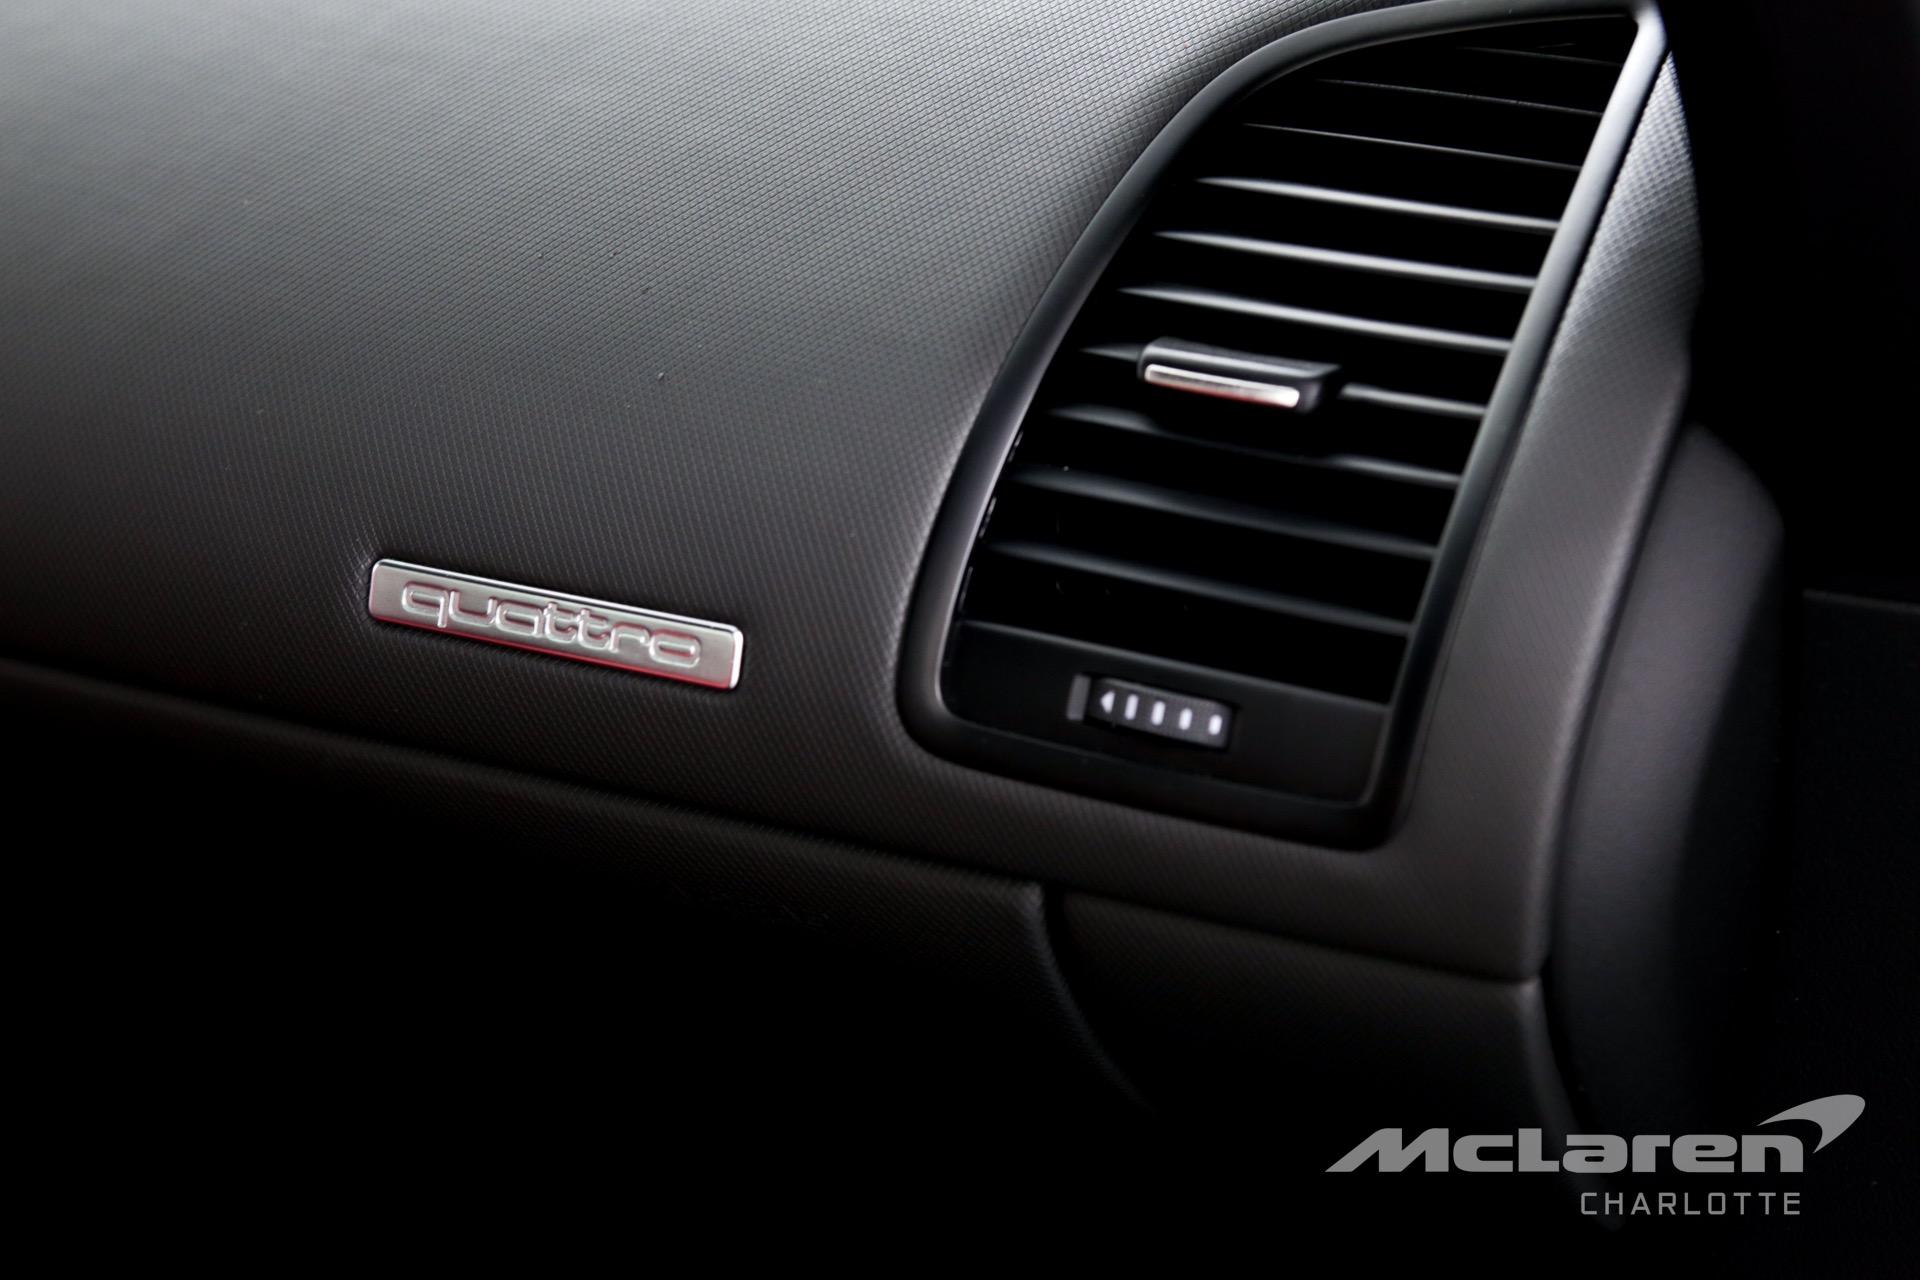 Used 2008 Audi R8 quattro | Charlotte, NC